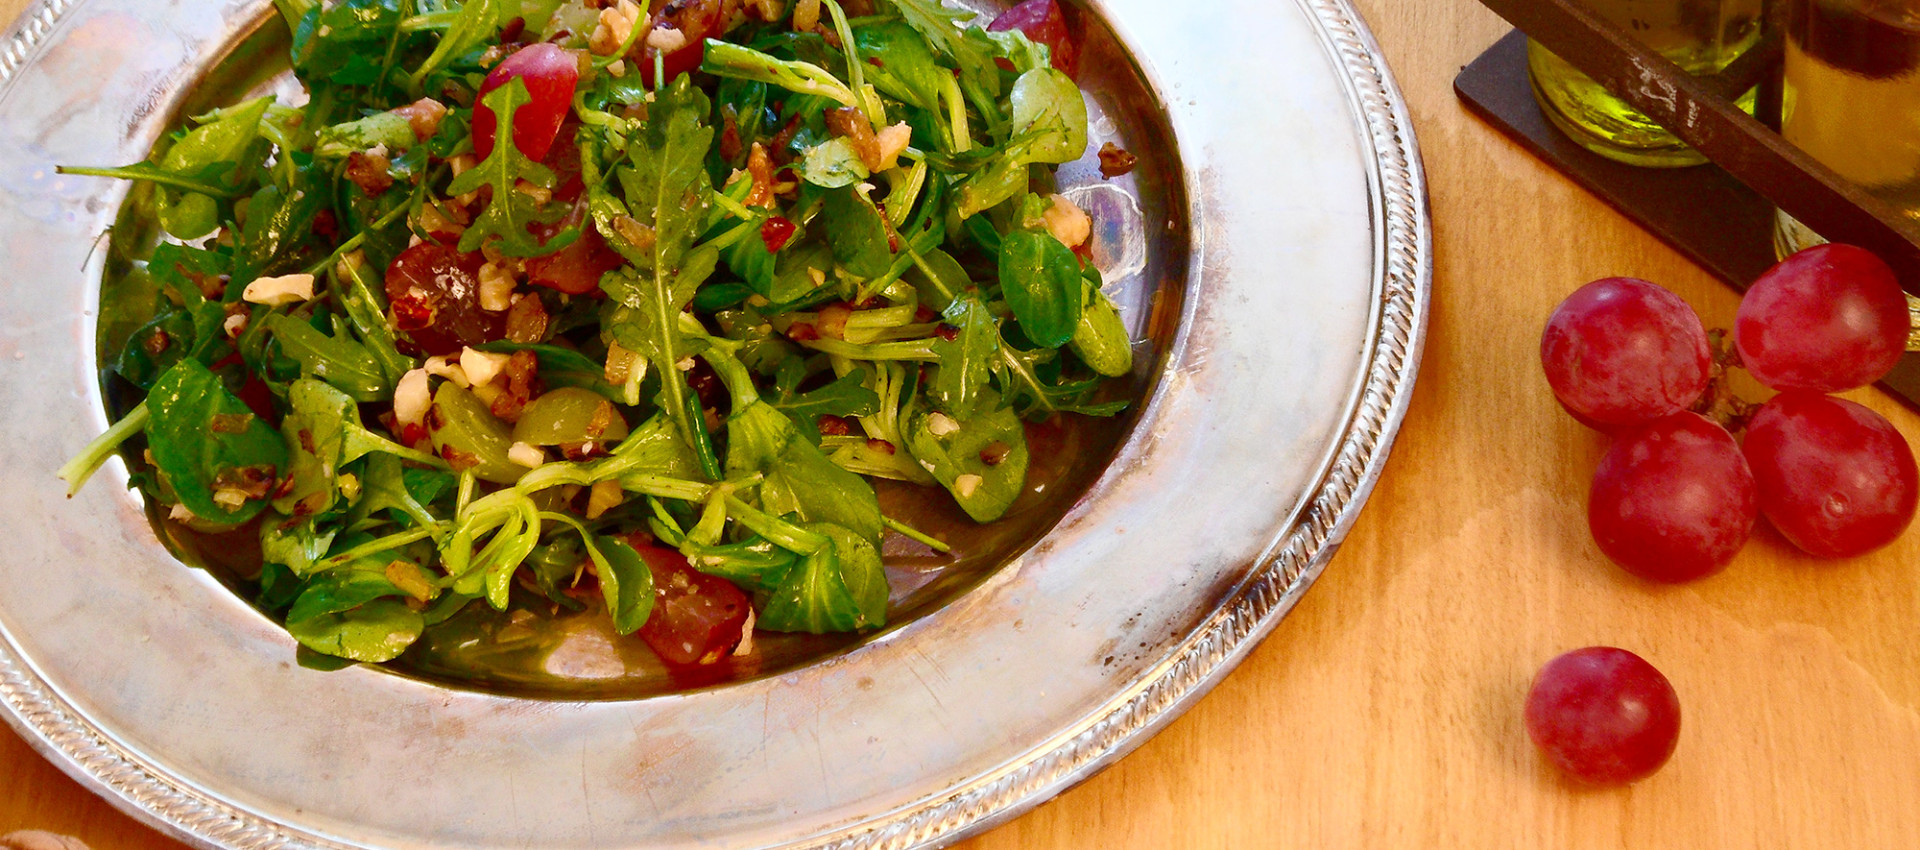 Rezept Salat mit Nüssen & Trauben - Kochbock.de